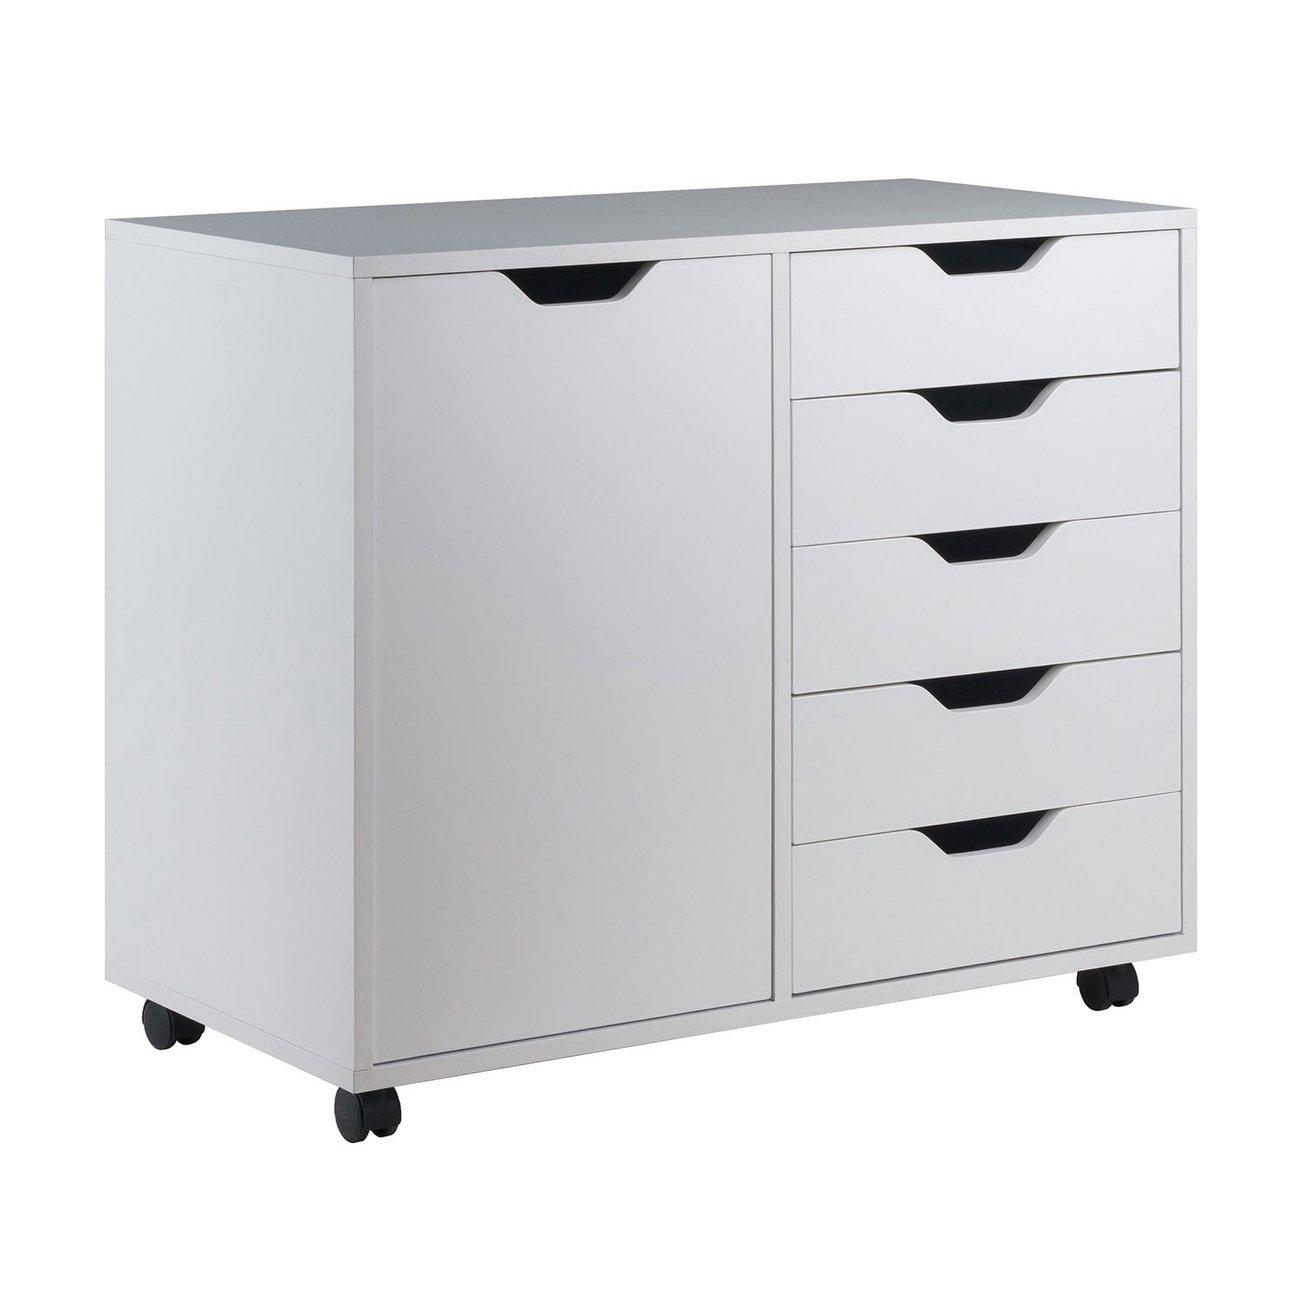 Winsome 30 71 W Halifax Wide Cabinet With 5 Gliding Drawers White Under Desk Storage Plastic Storage Units Storage